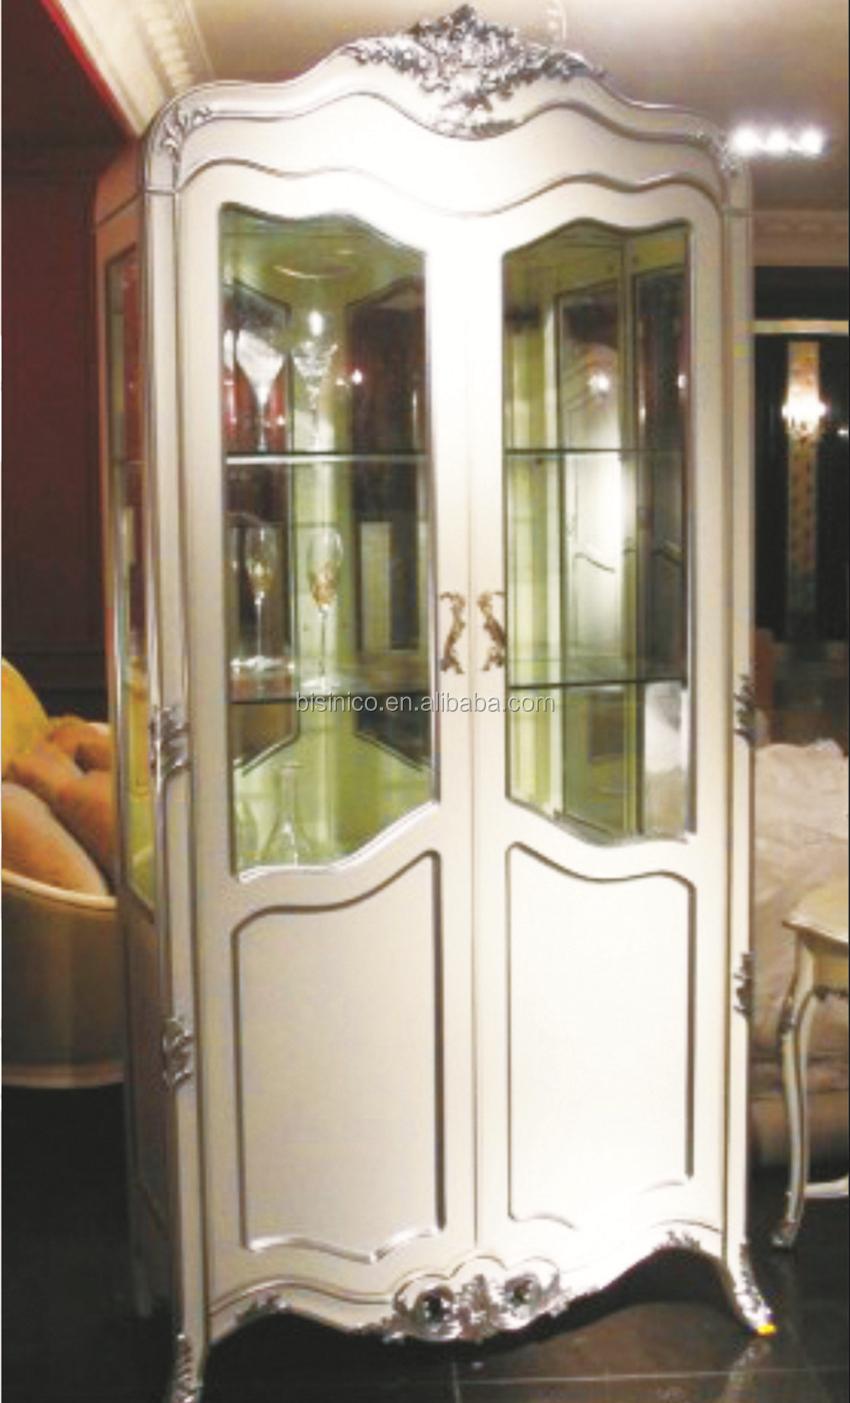 ornate design series dining room wine cabinet elegant home ornate design series dining room wine cabinet elegant home decorative display cabinet bf01